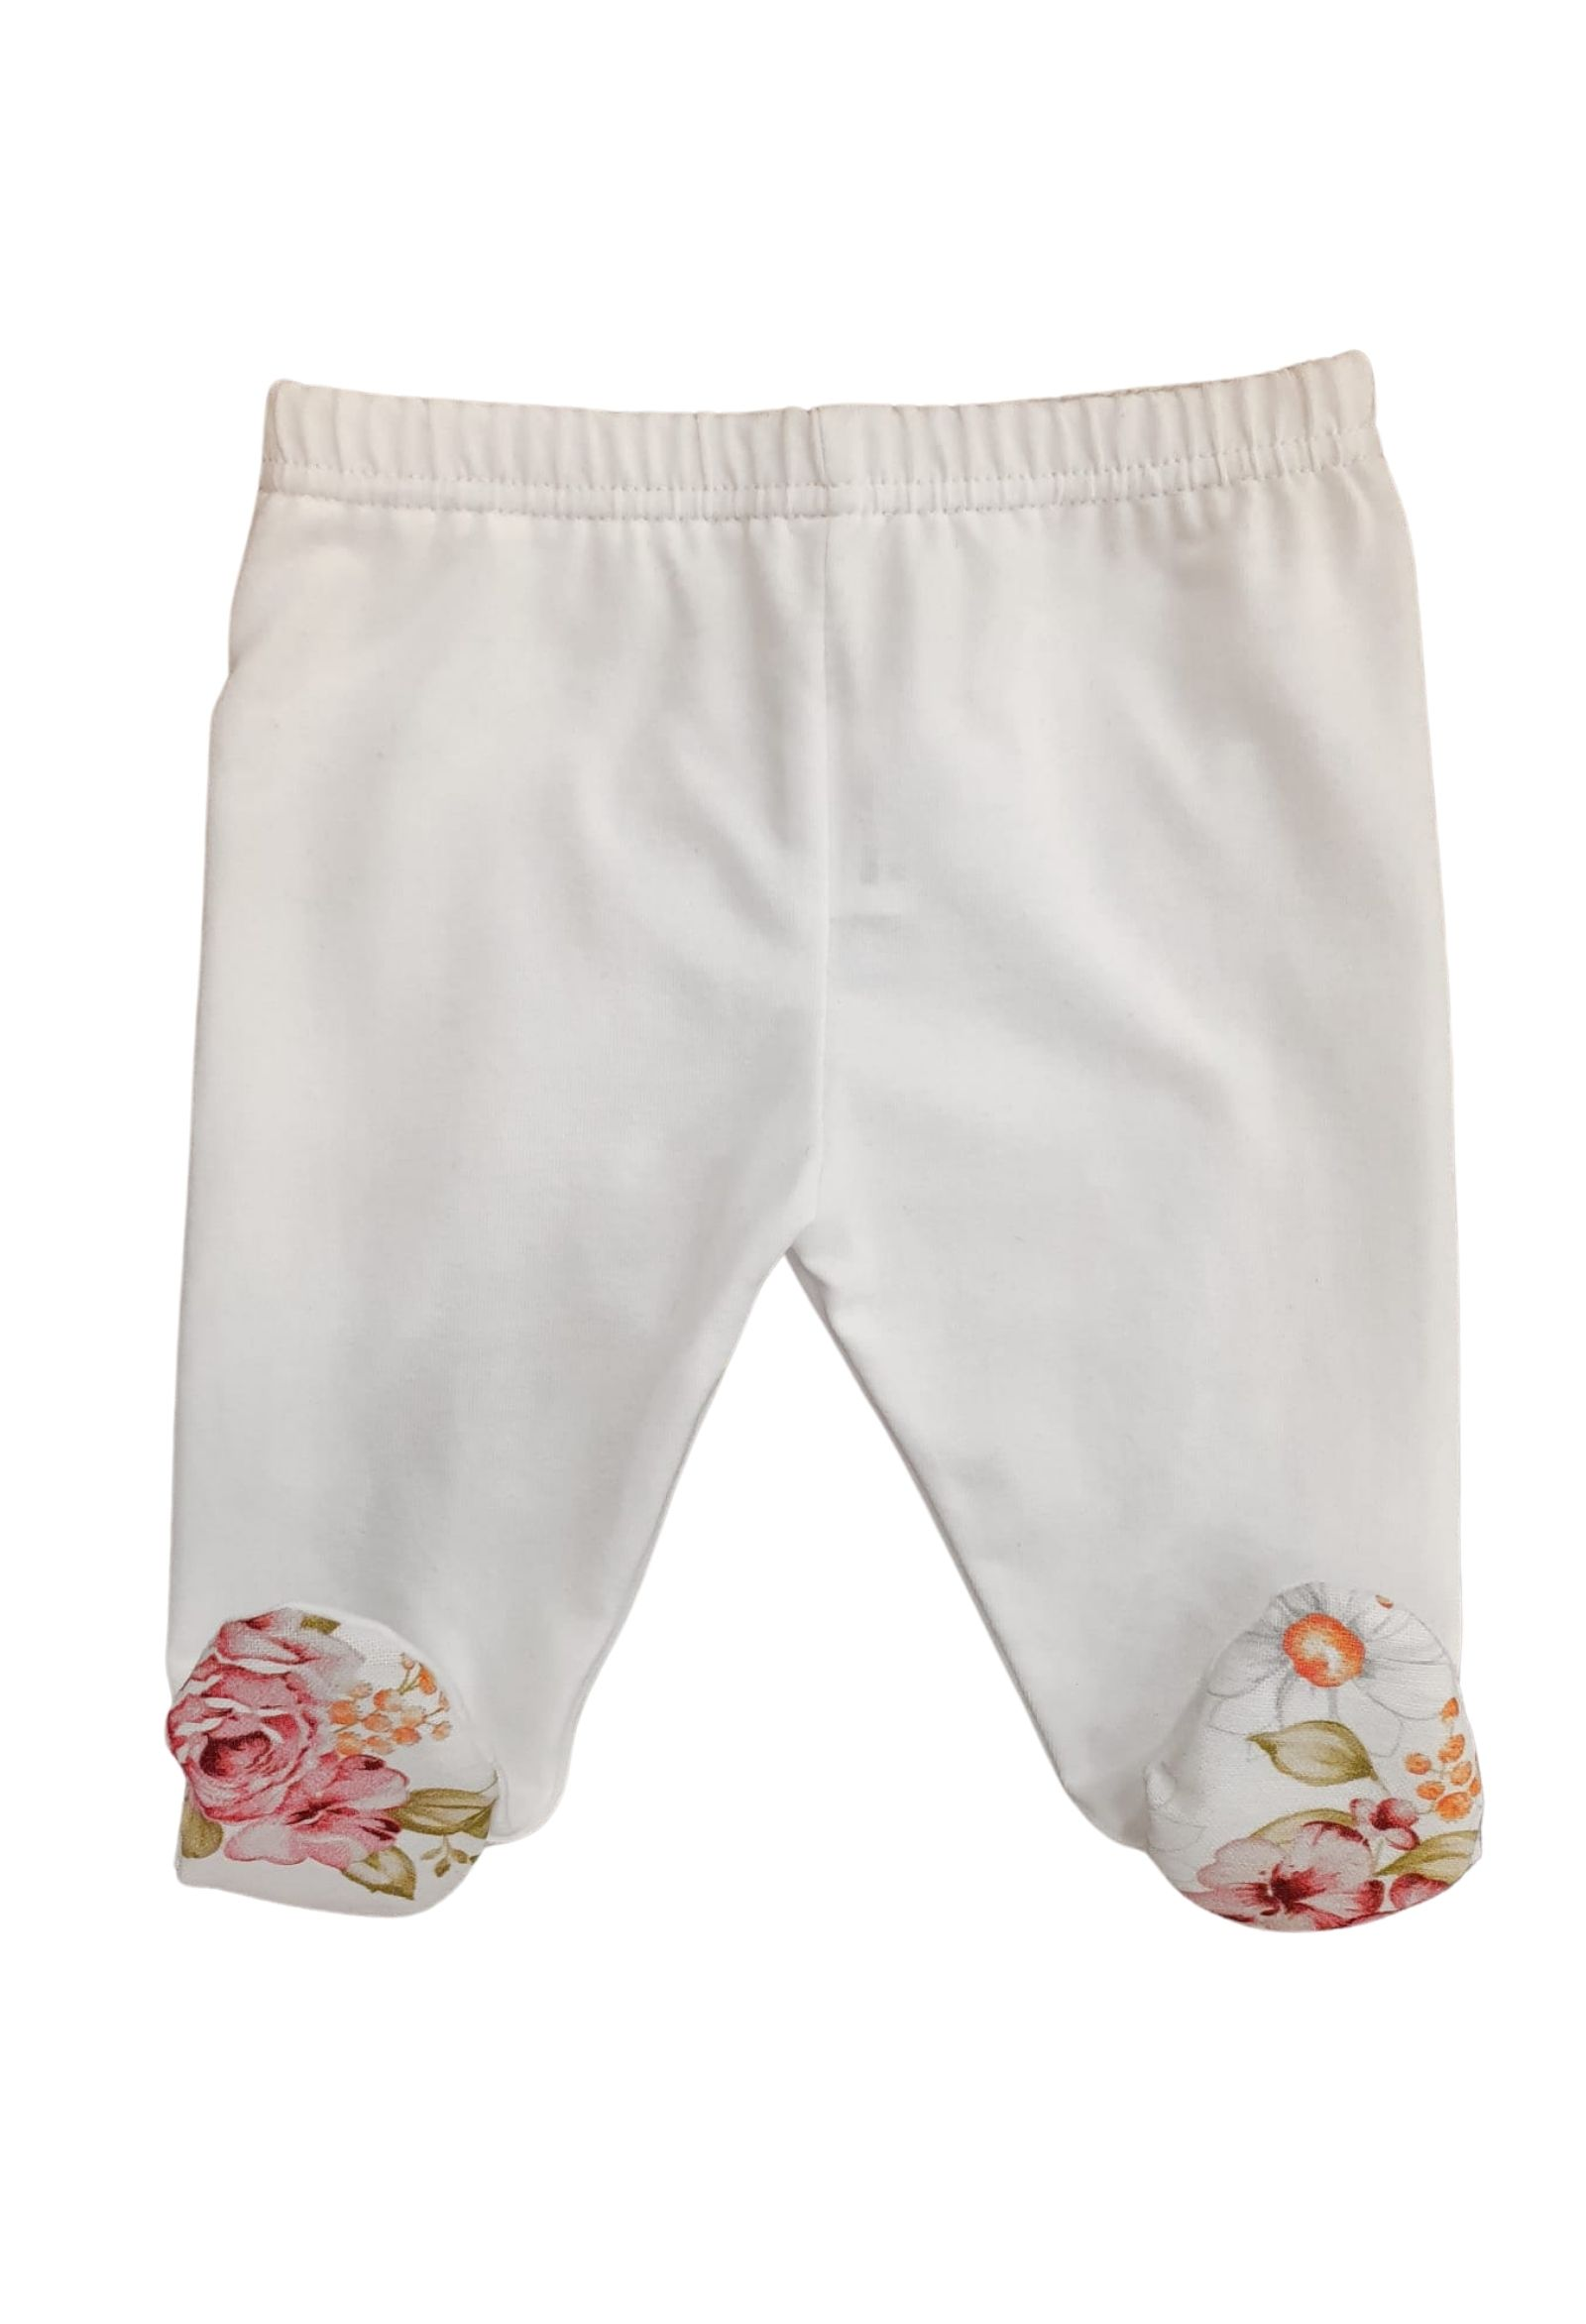 tutina due pezzi in cotone fantasia fiori juju bebe   Tutine   210615UNI